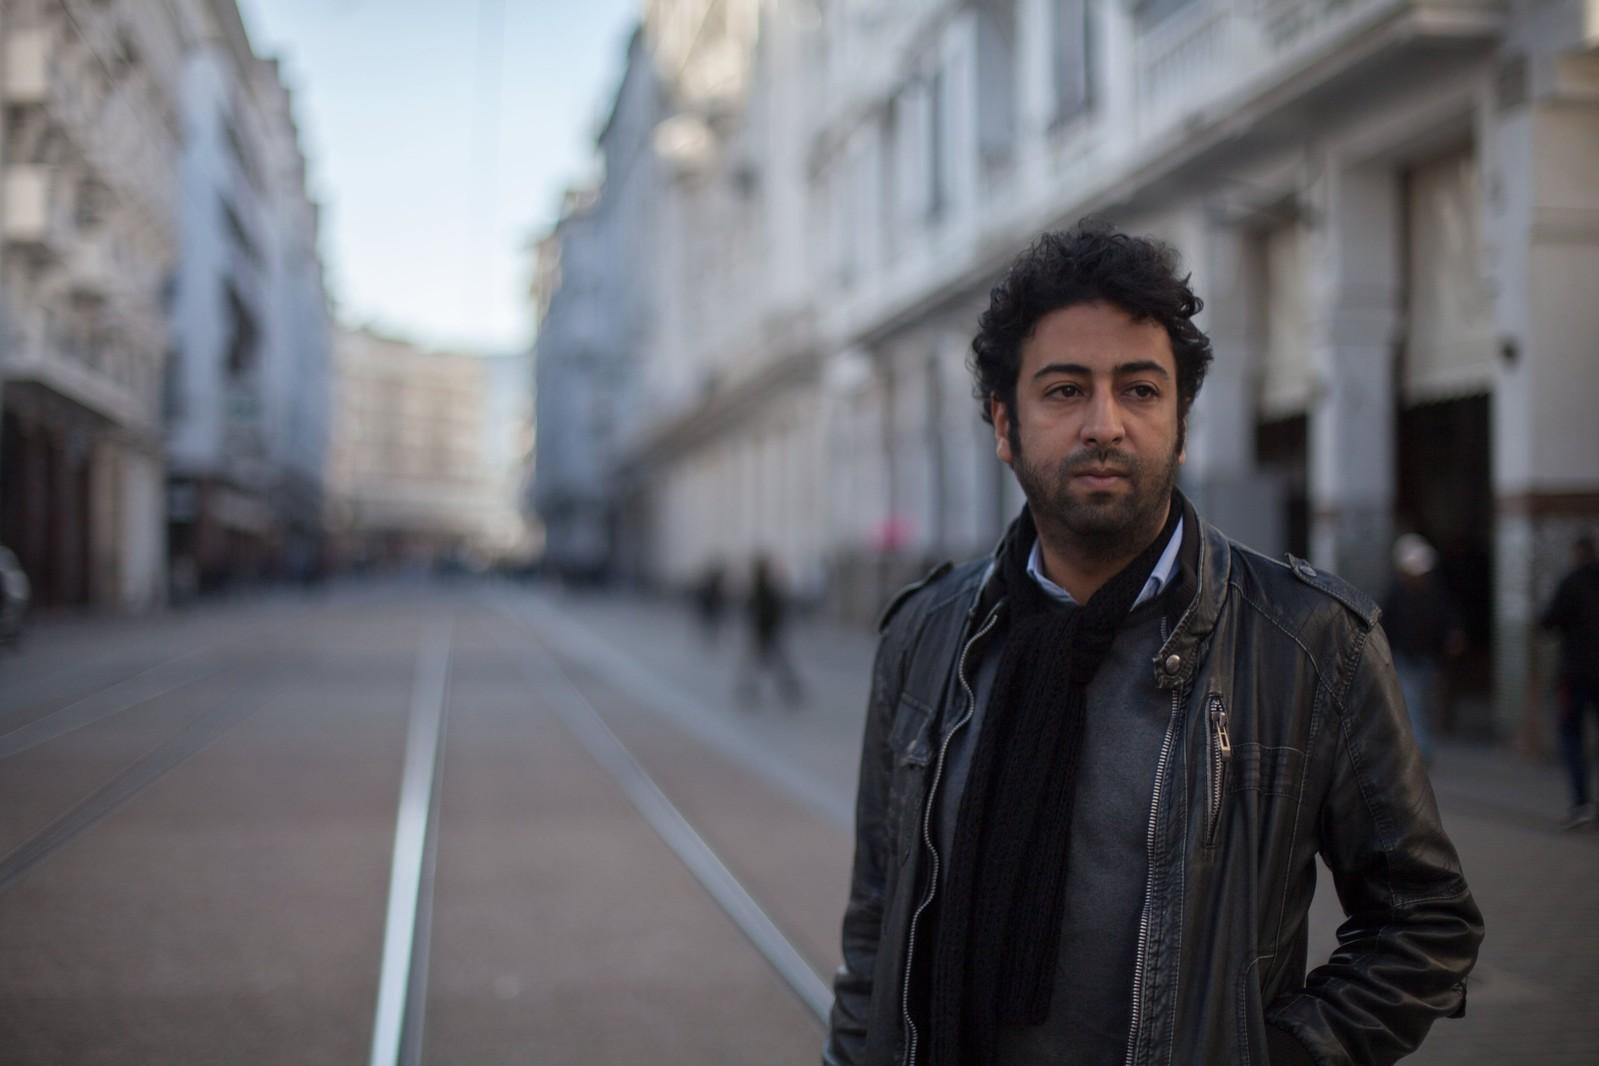 Urgent Action: Morocco – Stop harassing journalist Omar Radi